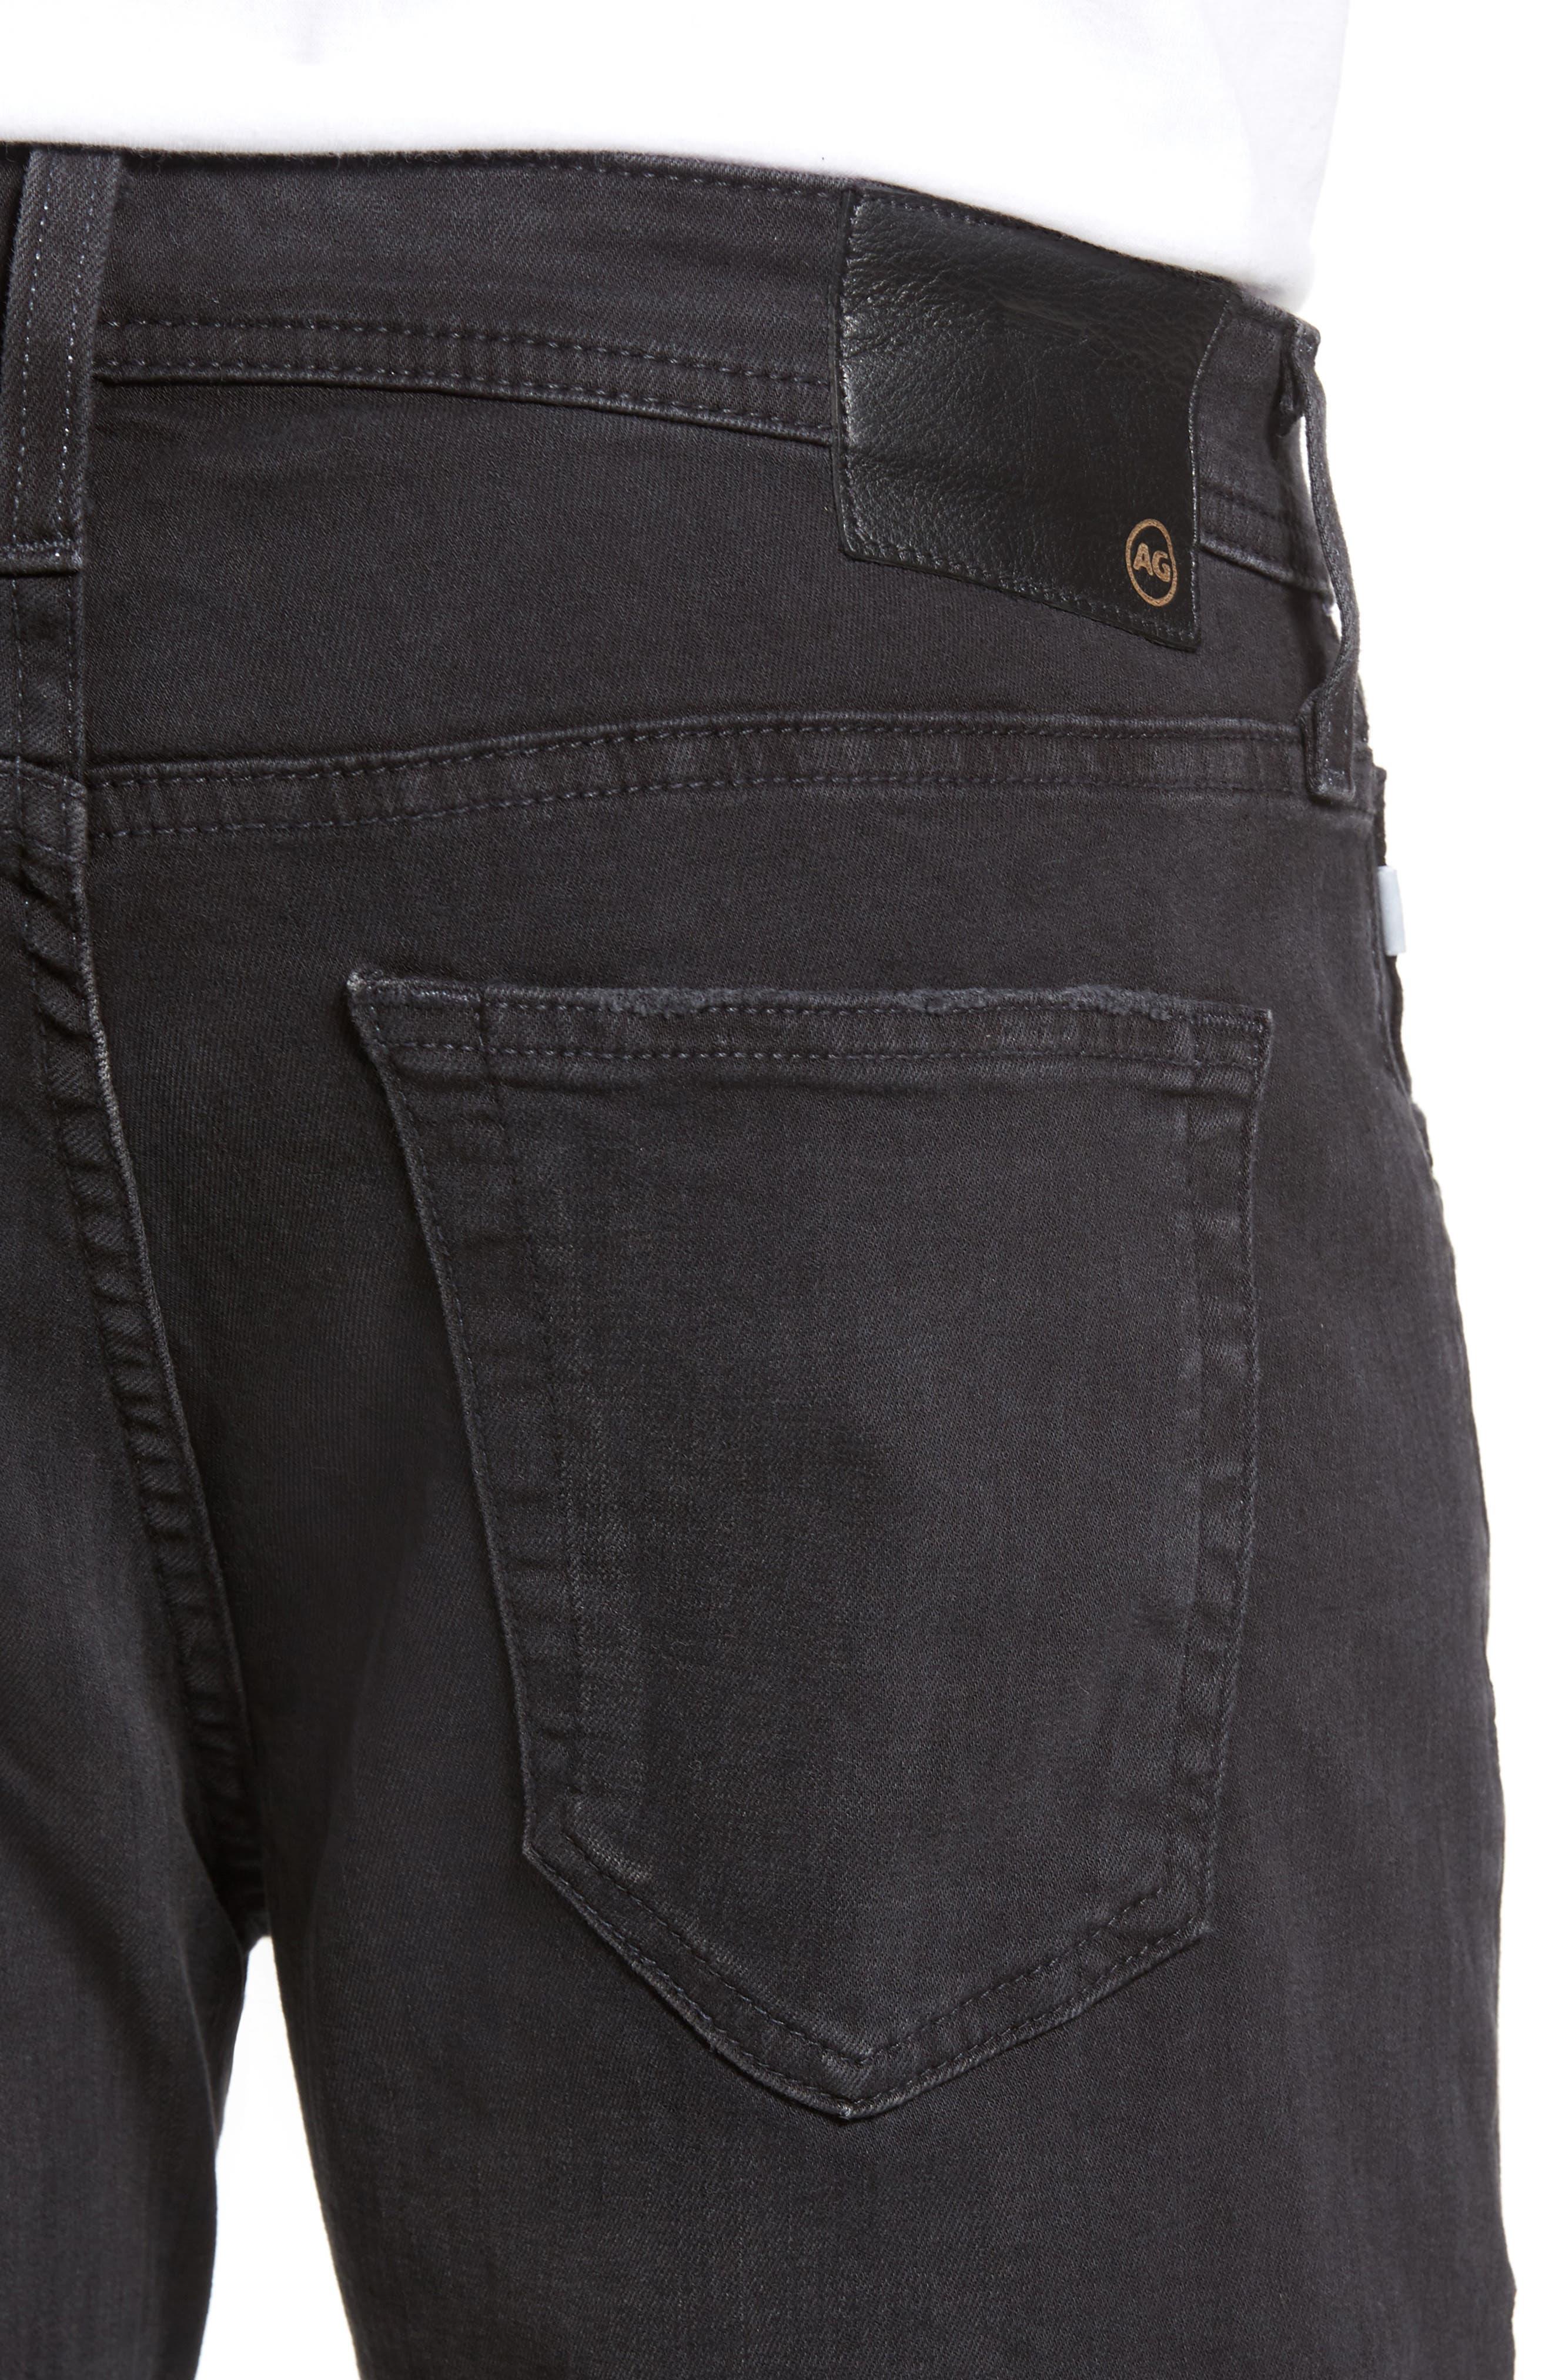 Tellis Slim Fit Jeans,                             Alternate thumbnail 4, color,                             3 Years Cinema